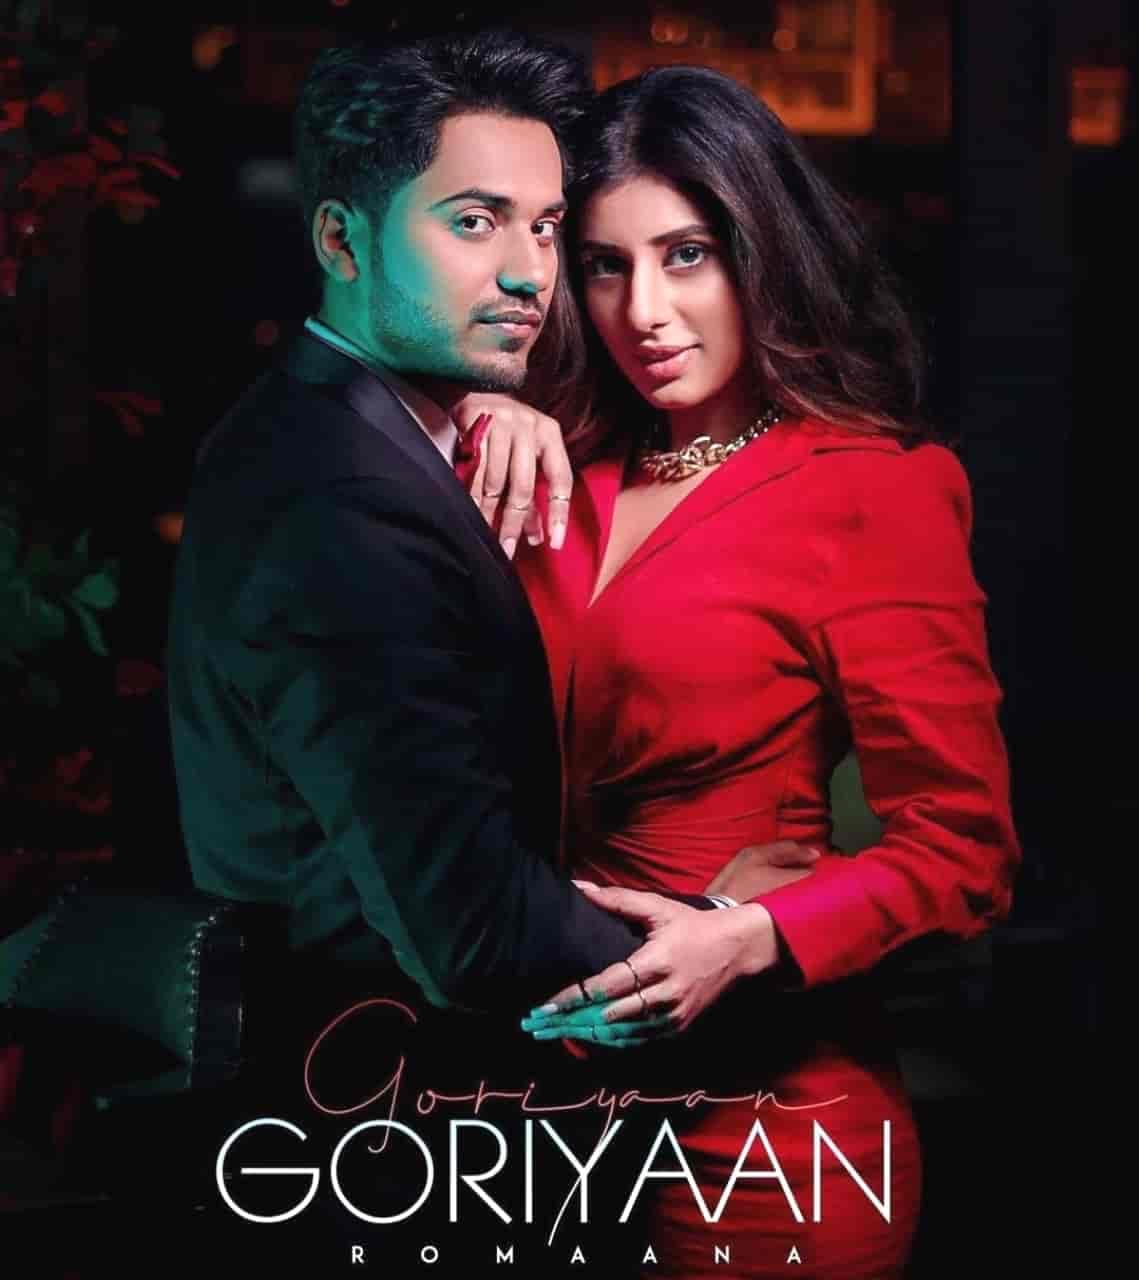 Goriyaan Goriyaan Punjabi Song Lyrics Romana